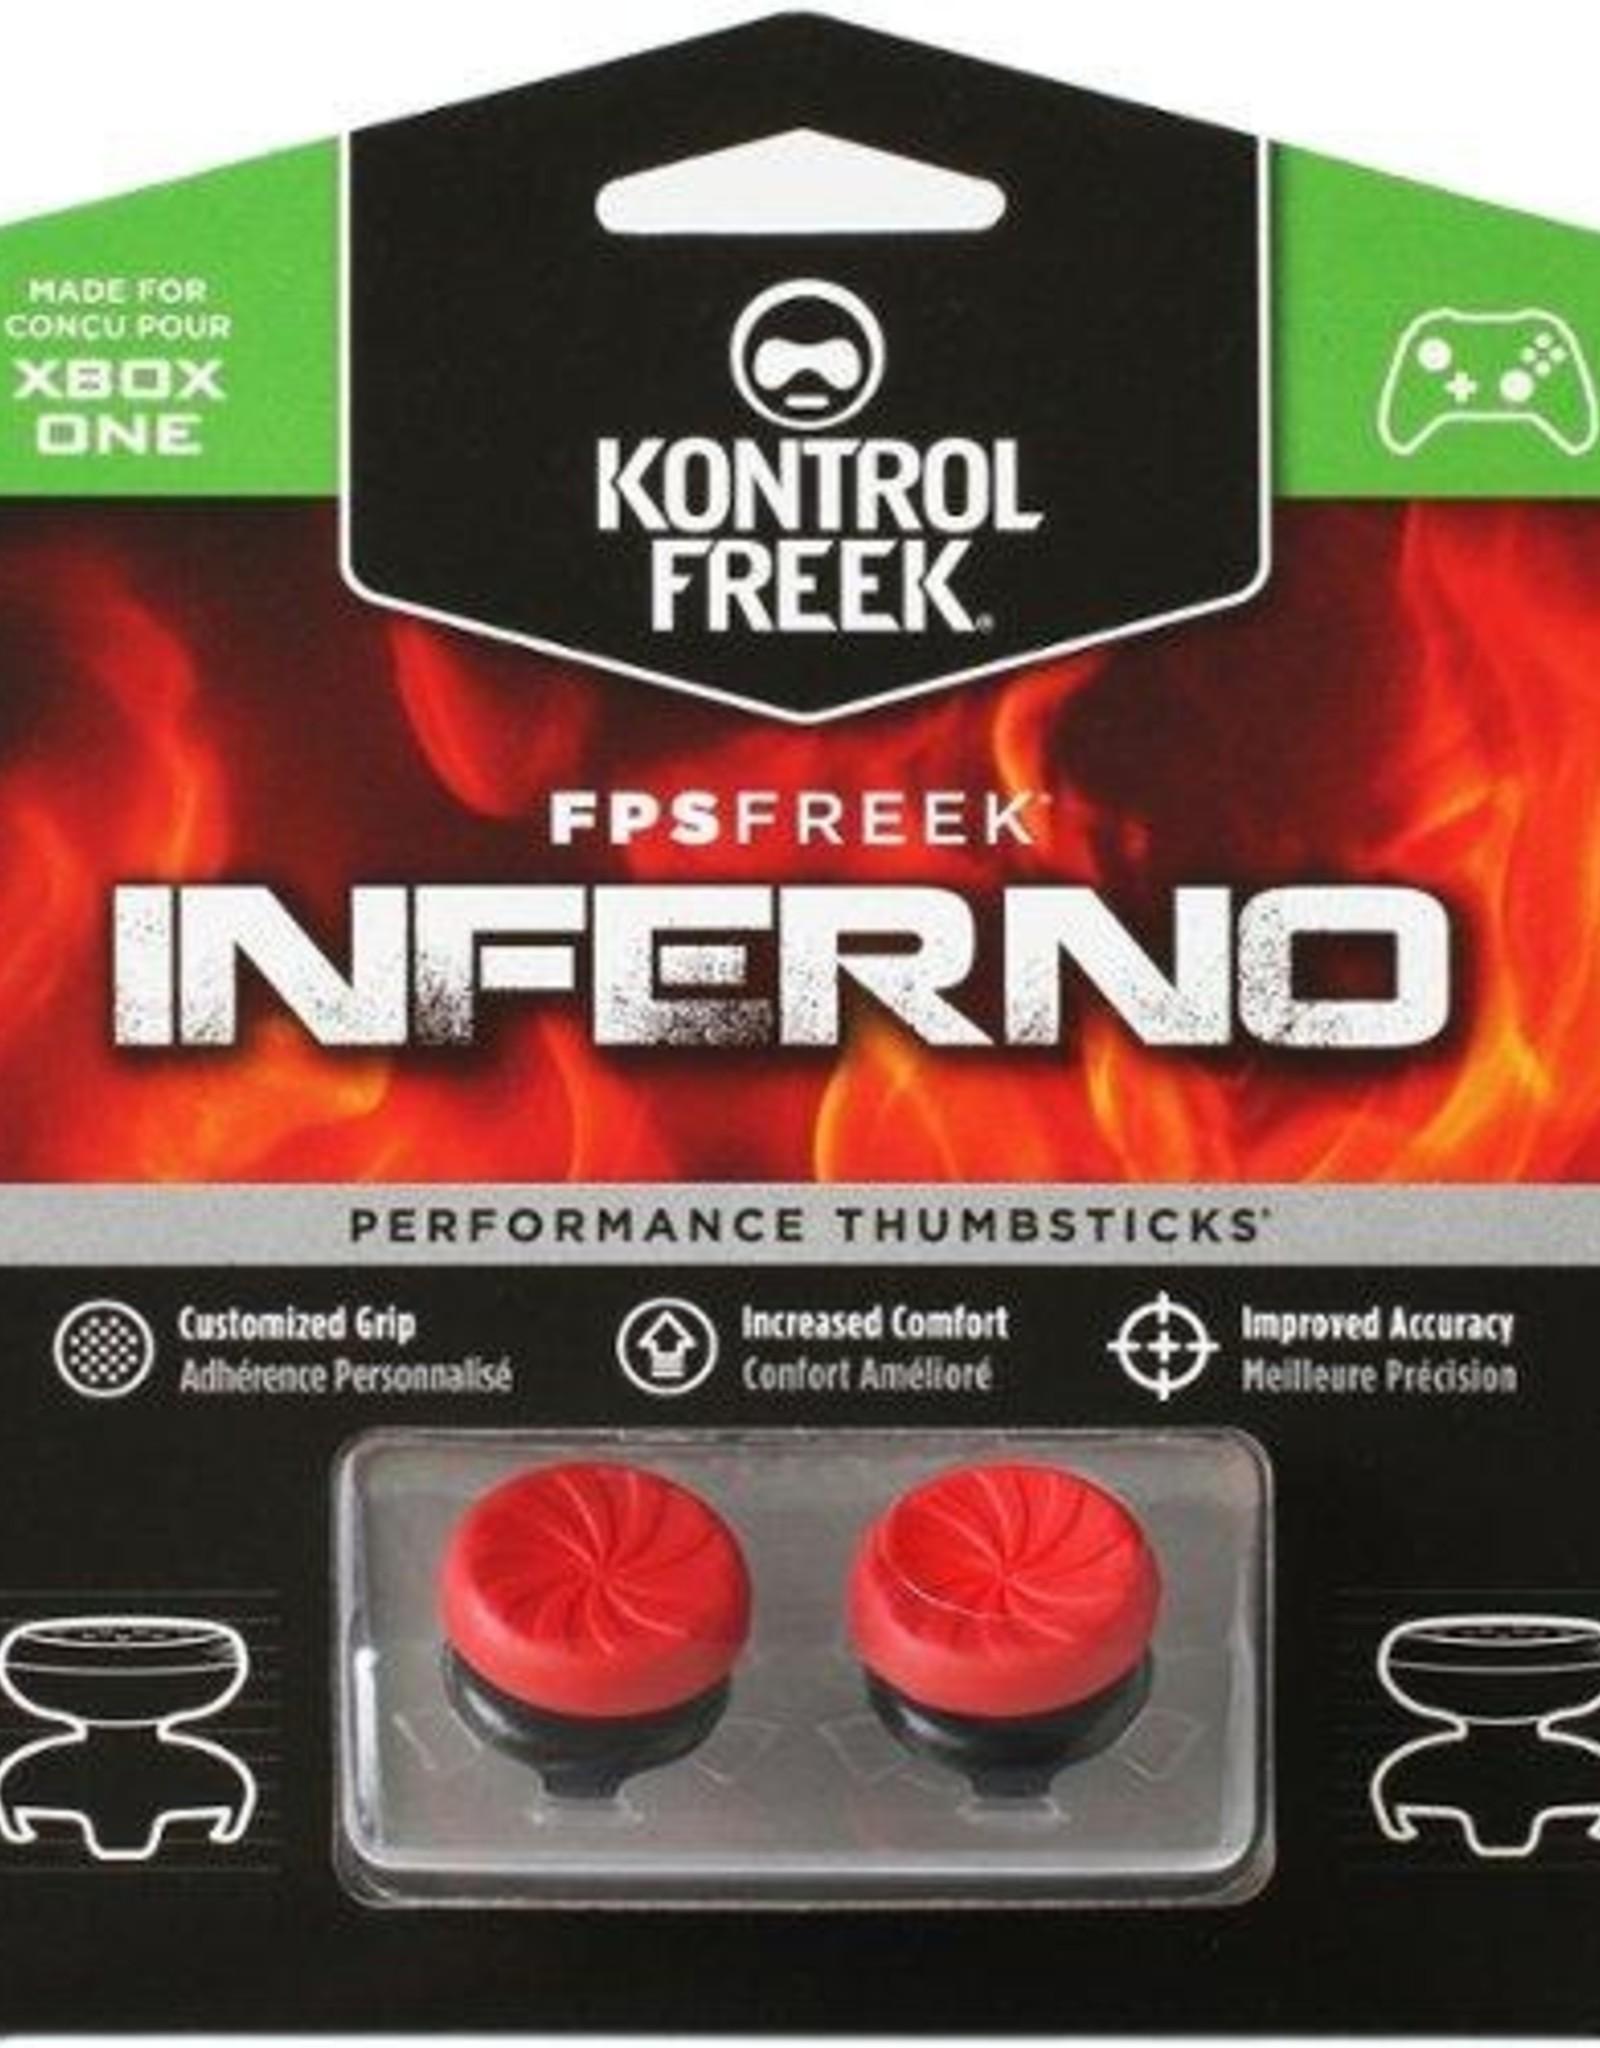 KontrolFreek XBOX ONE FPS Inferno High Rise Thumb Grip Analog Cover